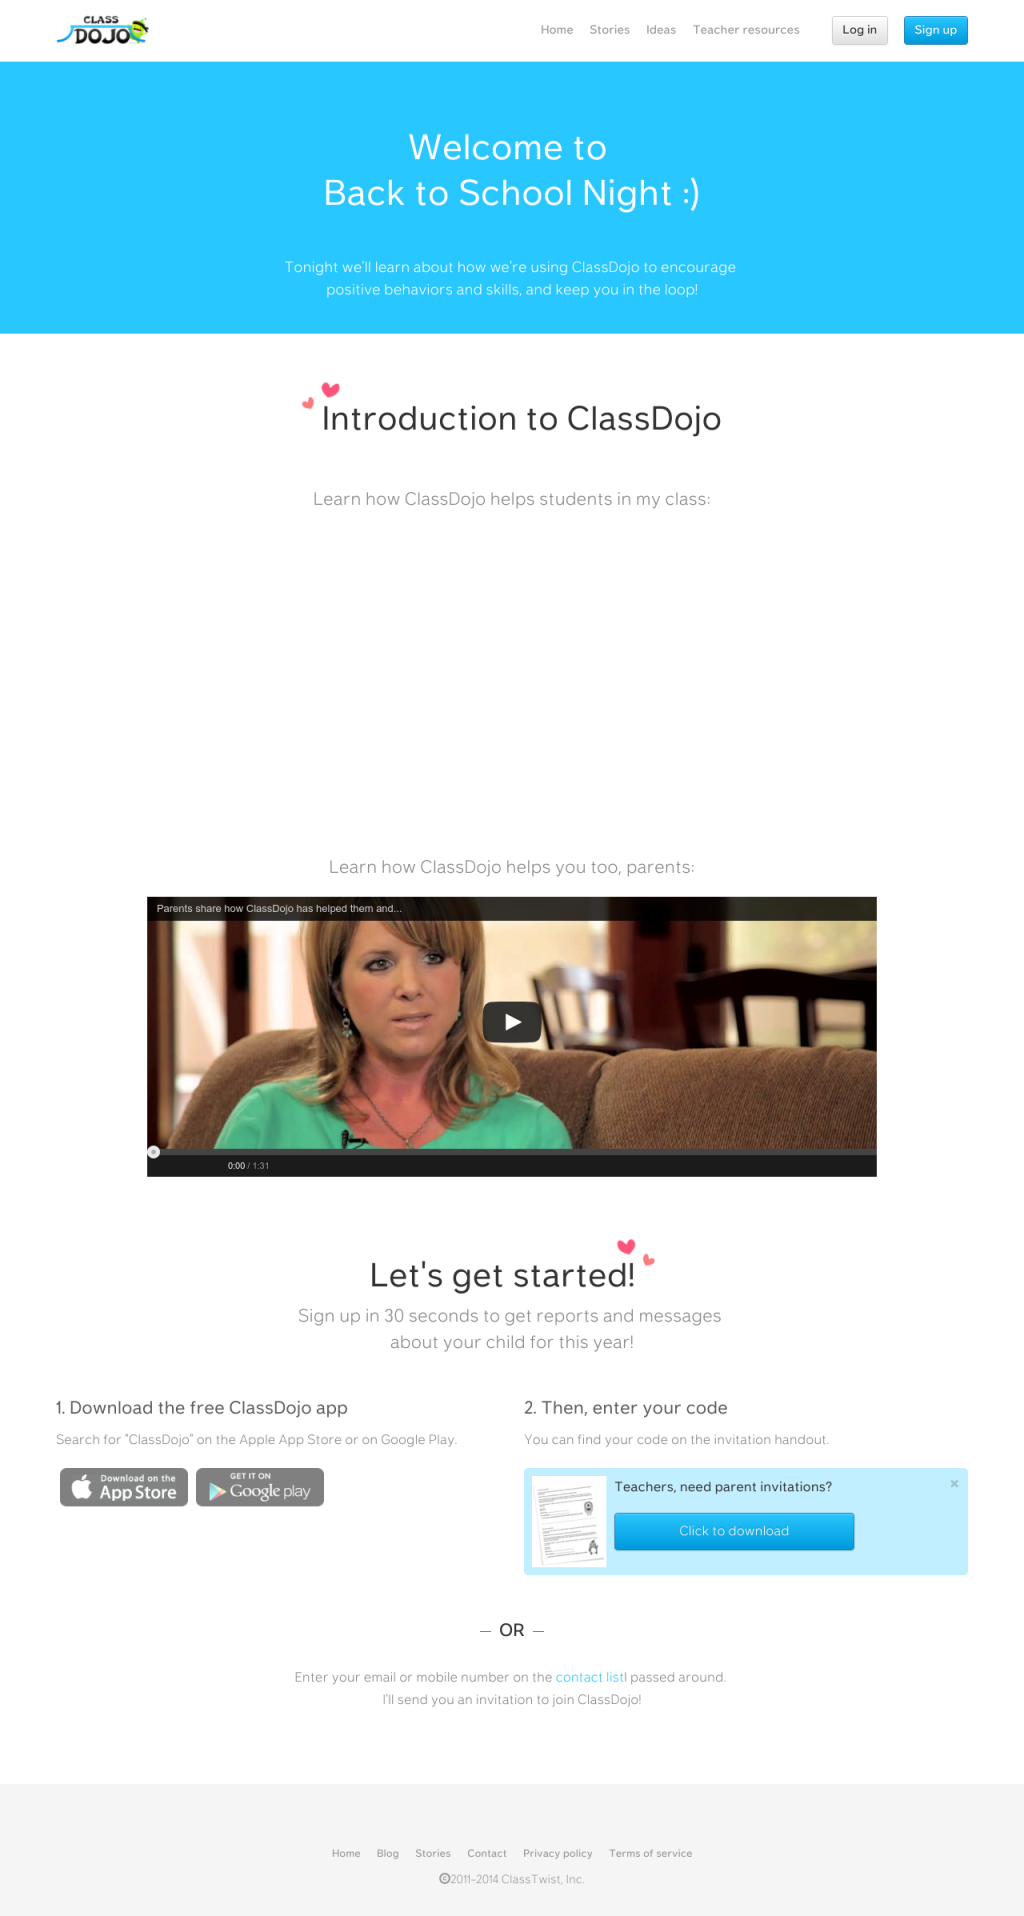 Snapito Full Page Screenshot API Class dojo, Back to